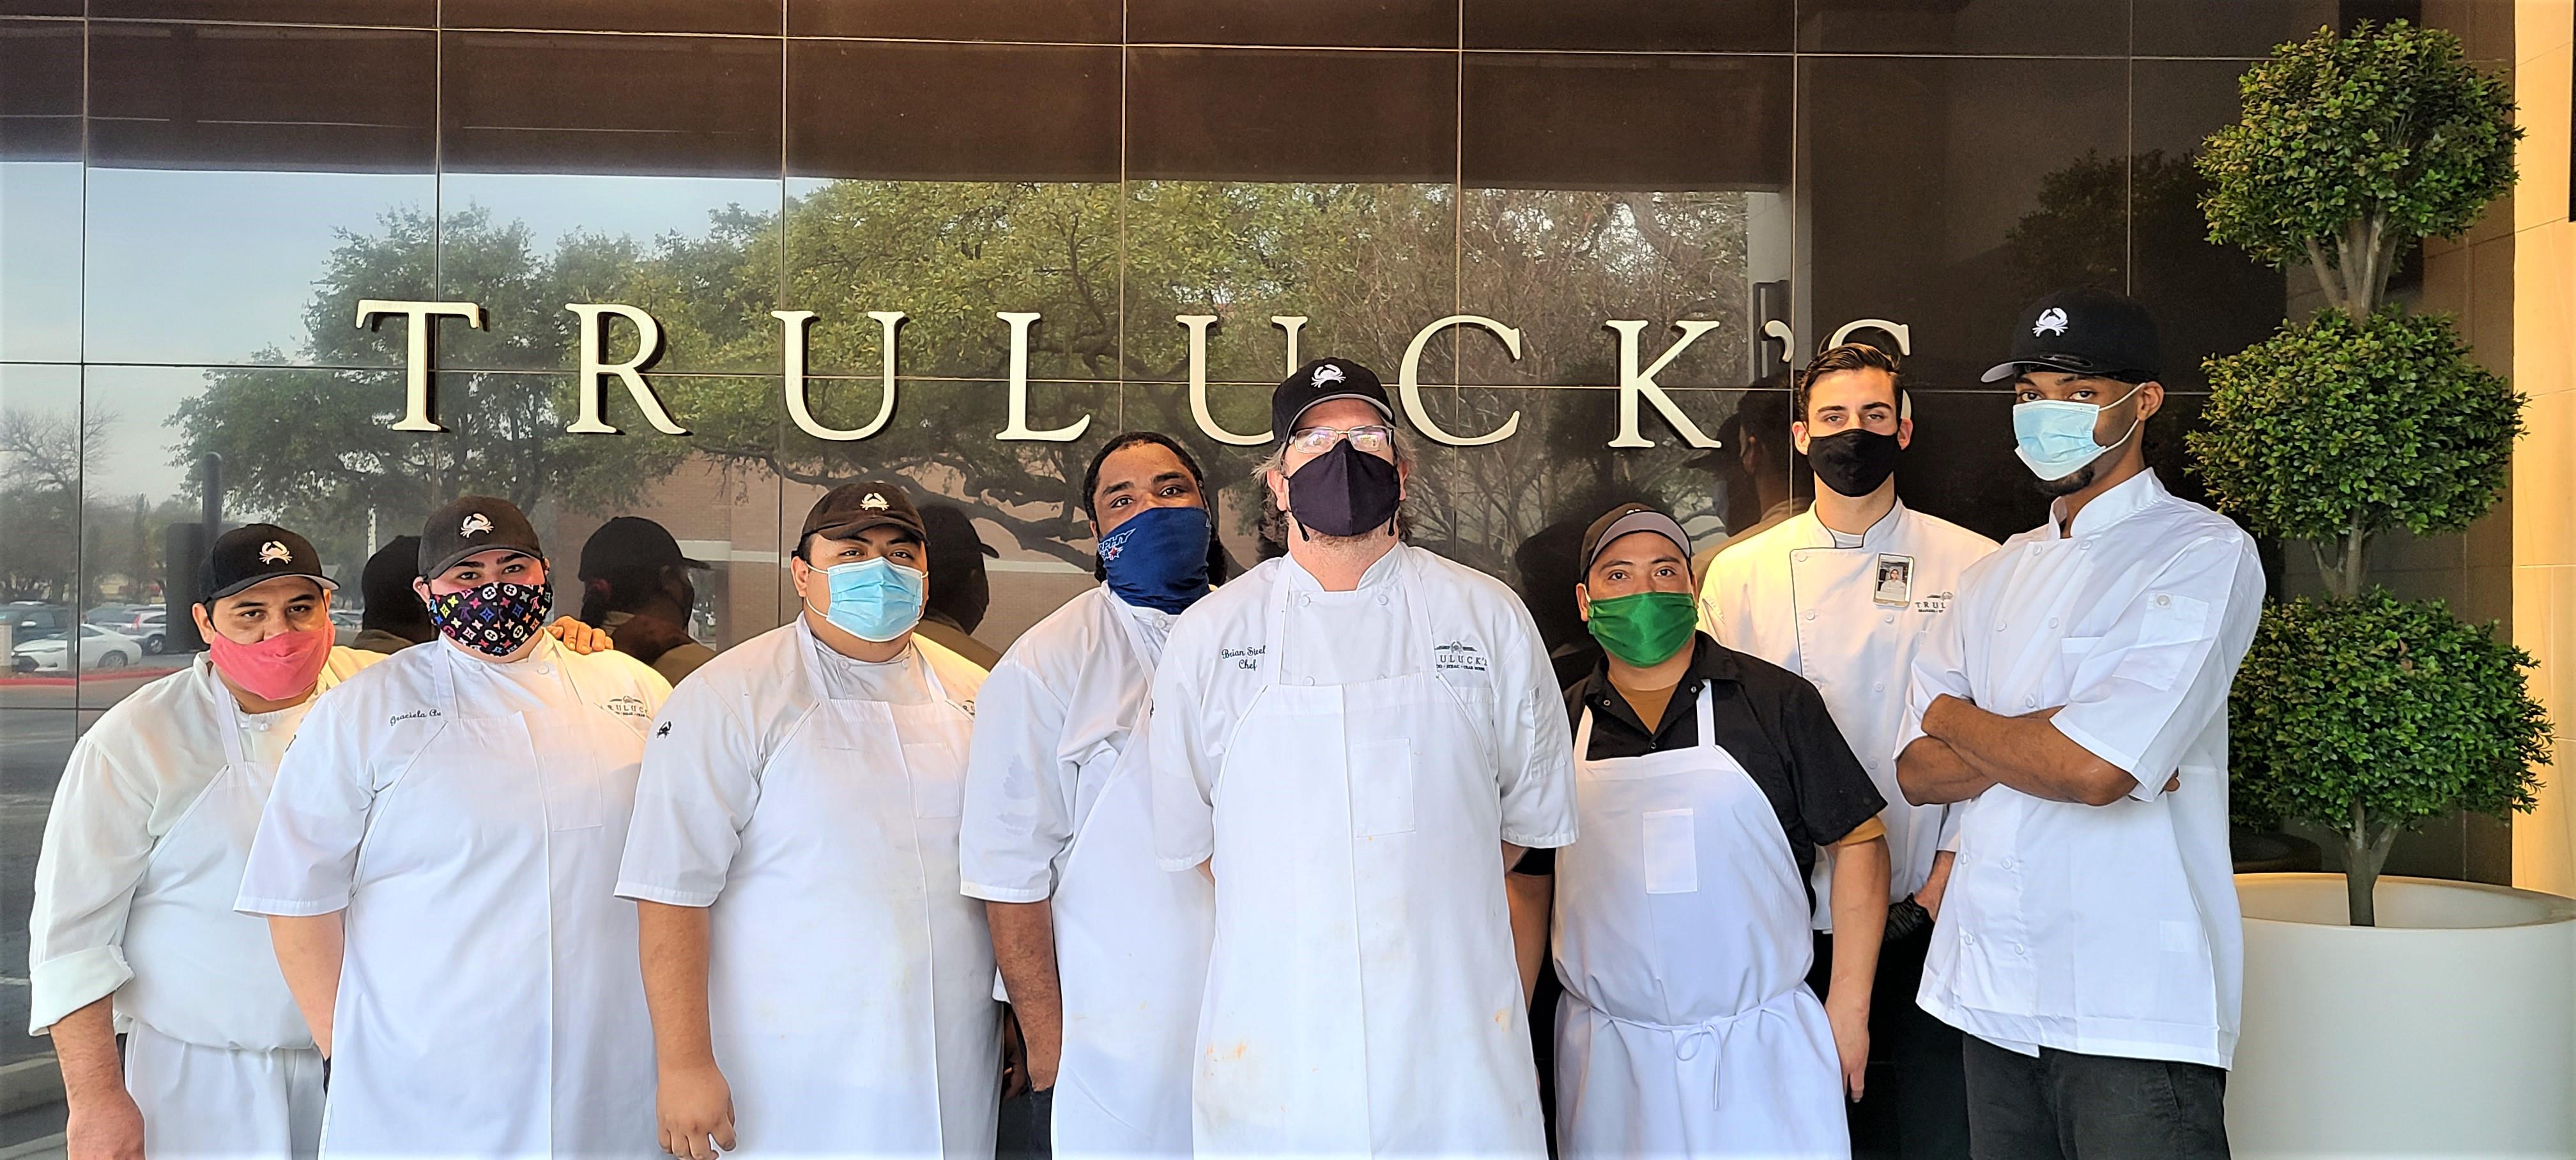 Arboretum Culinary team members